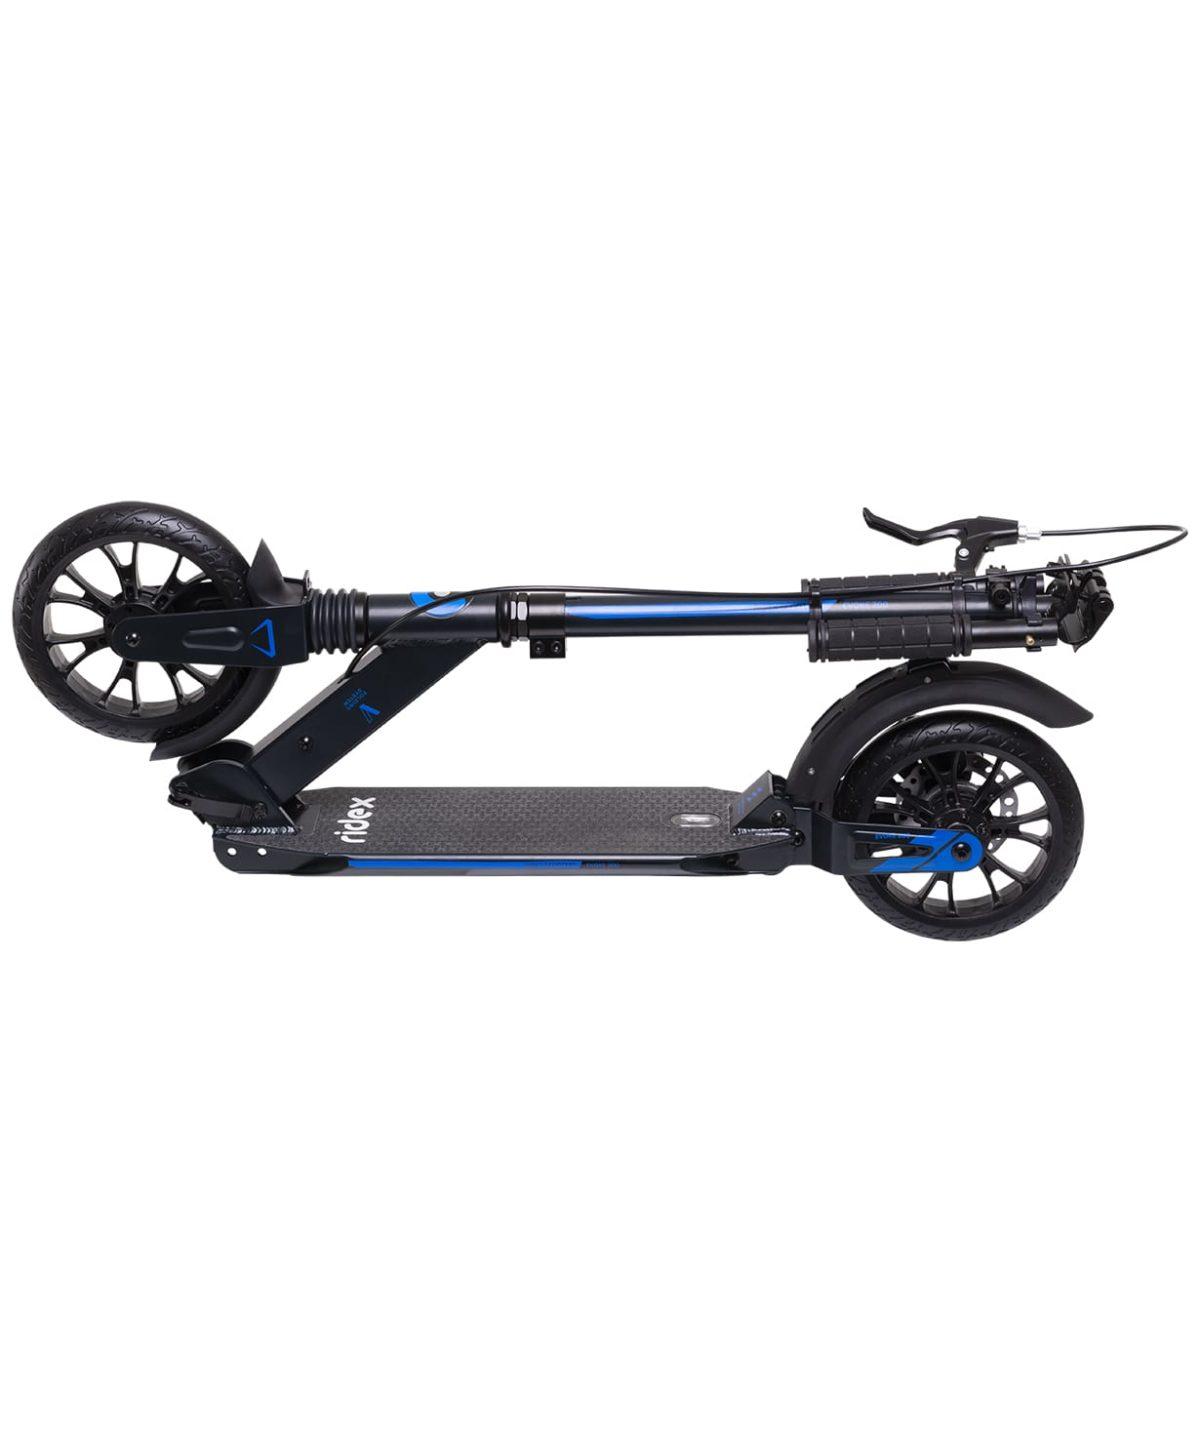 RIDEX Evoke Самокат 2-колесный с дисковым тормозом 200 мм  Evoke: синий - 6